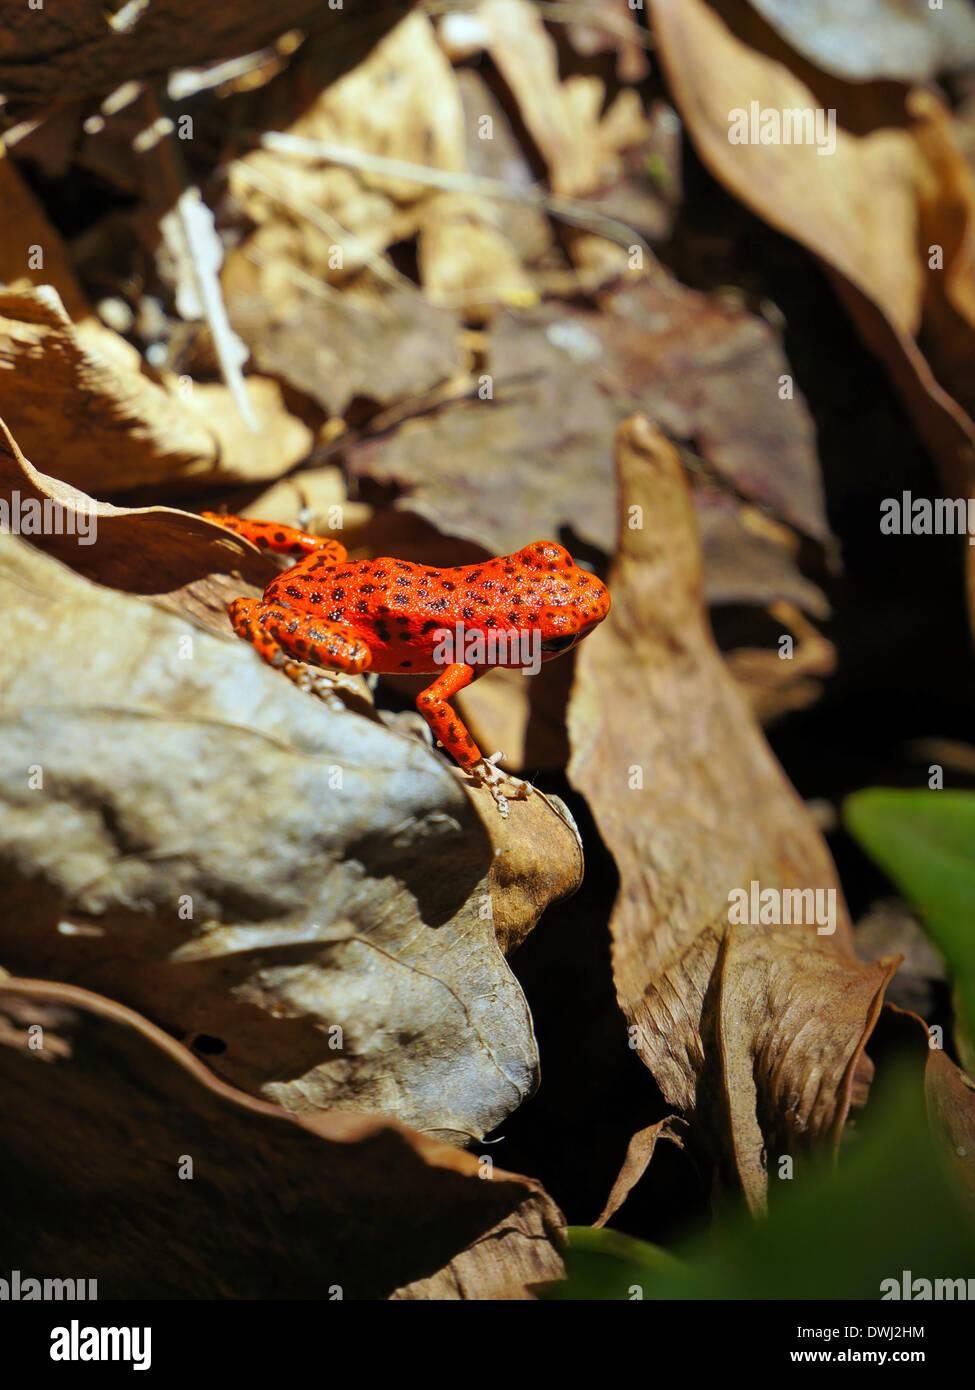 Strawberry poison dart frog, Oophaga pumilio, Bastimentos island, Bocas del Toro, Panama - Stock Image